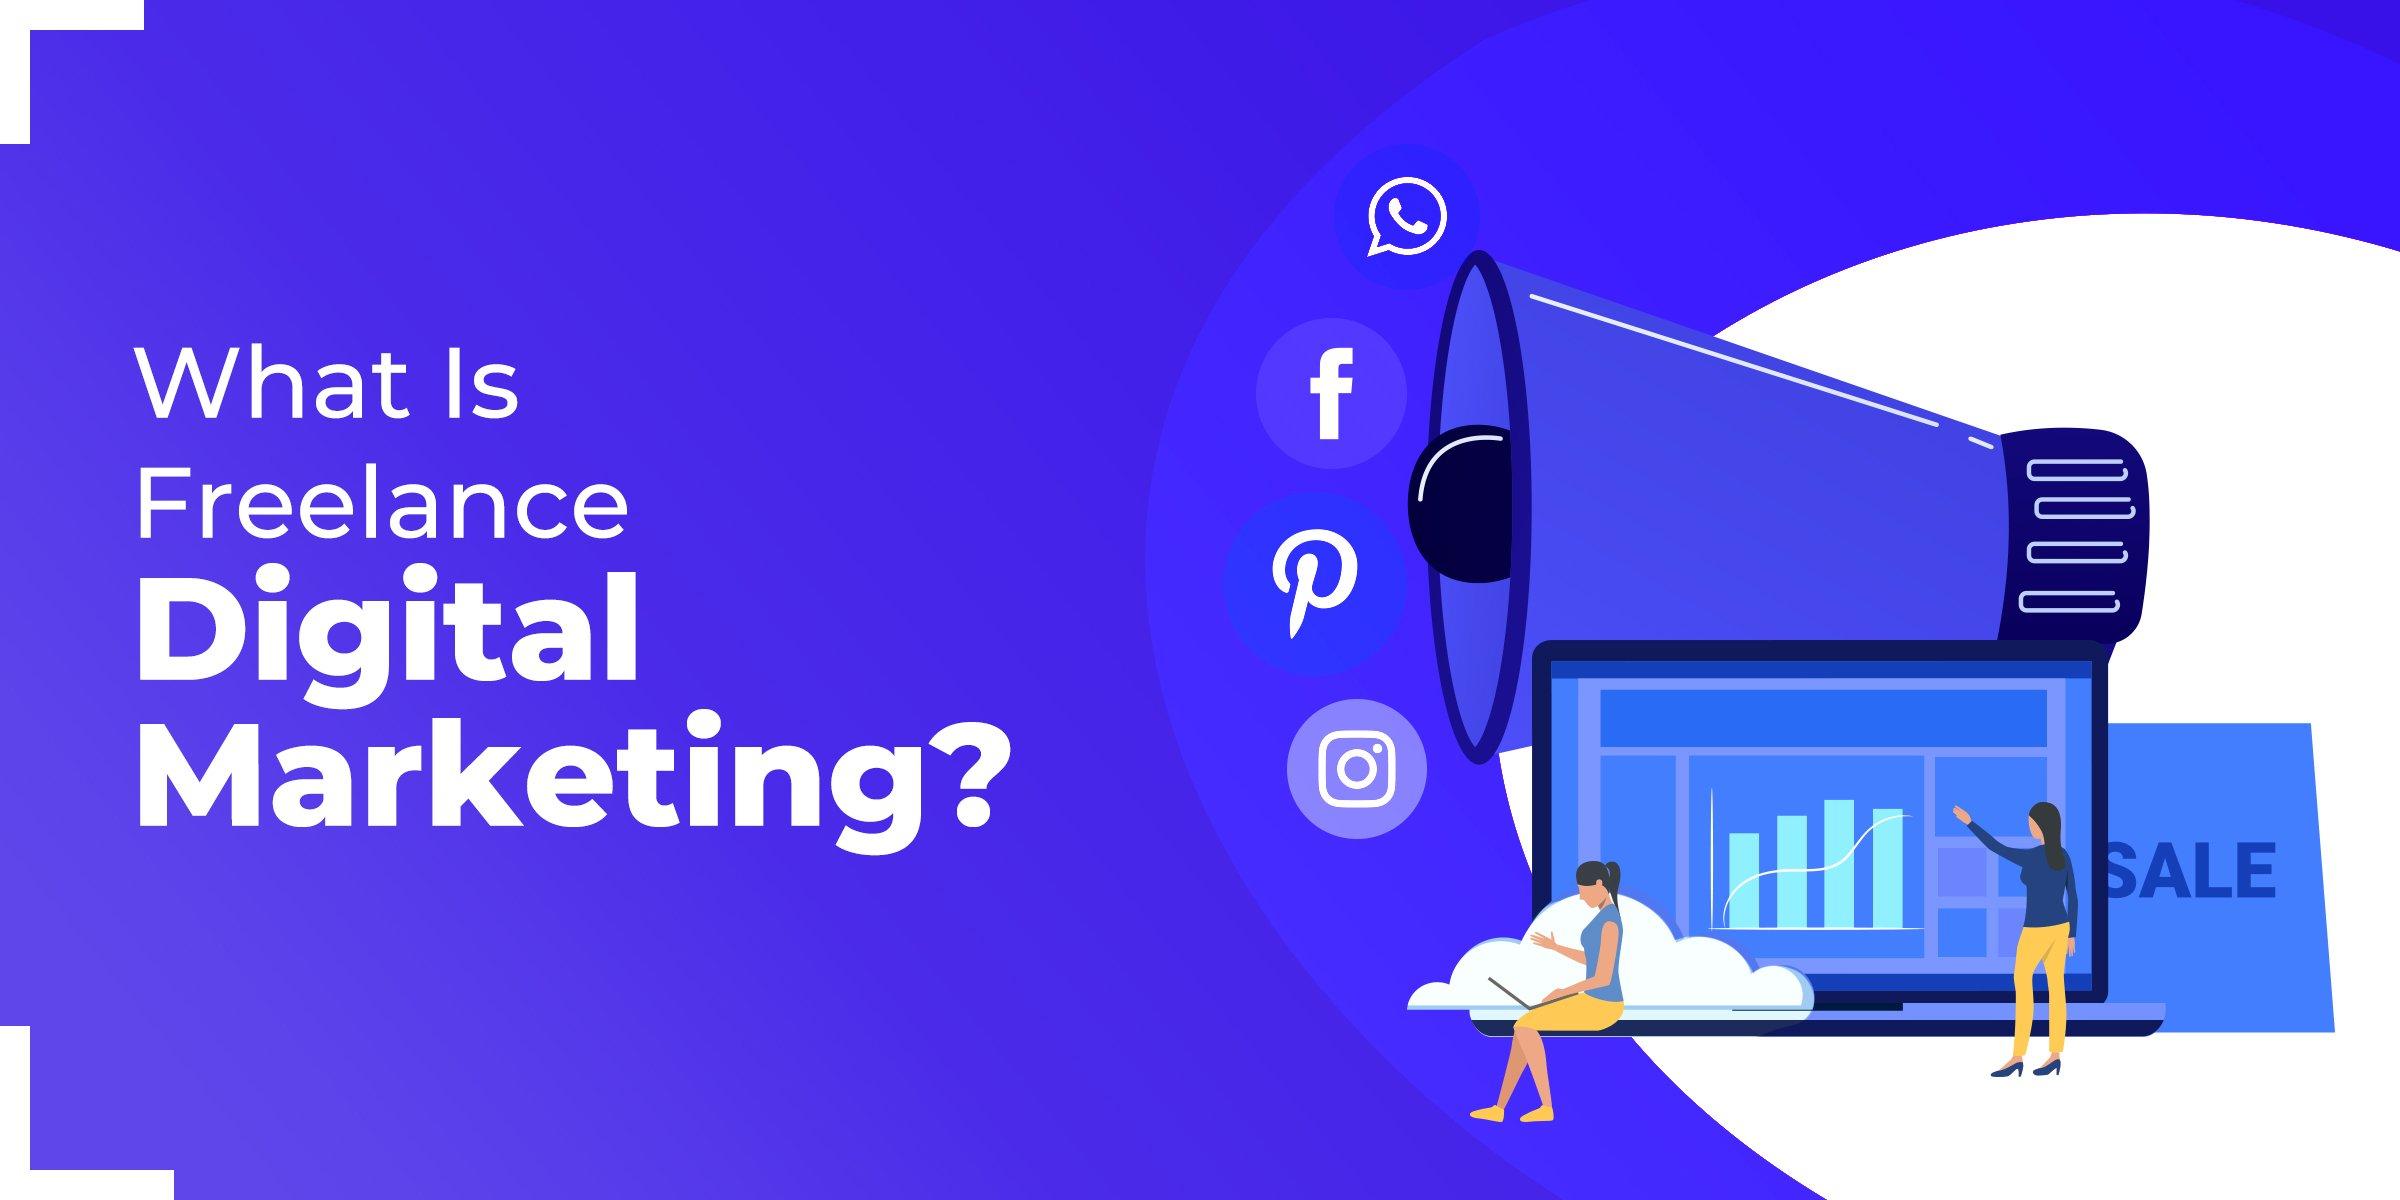 What is Freelance Digital Marketing?